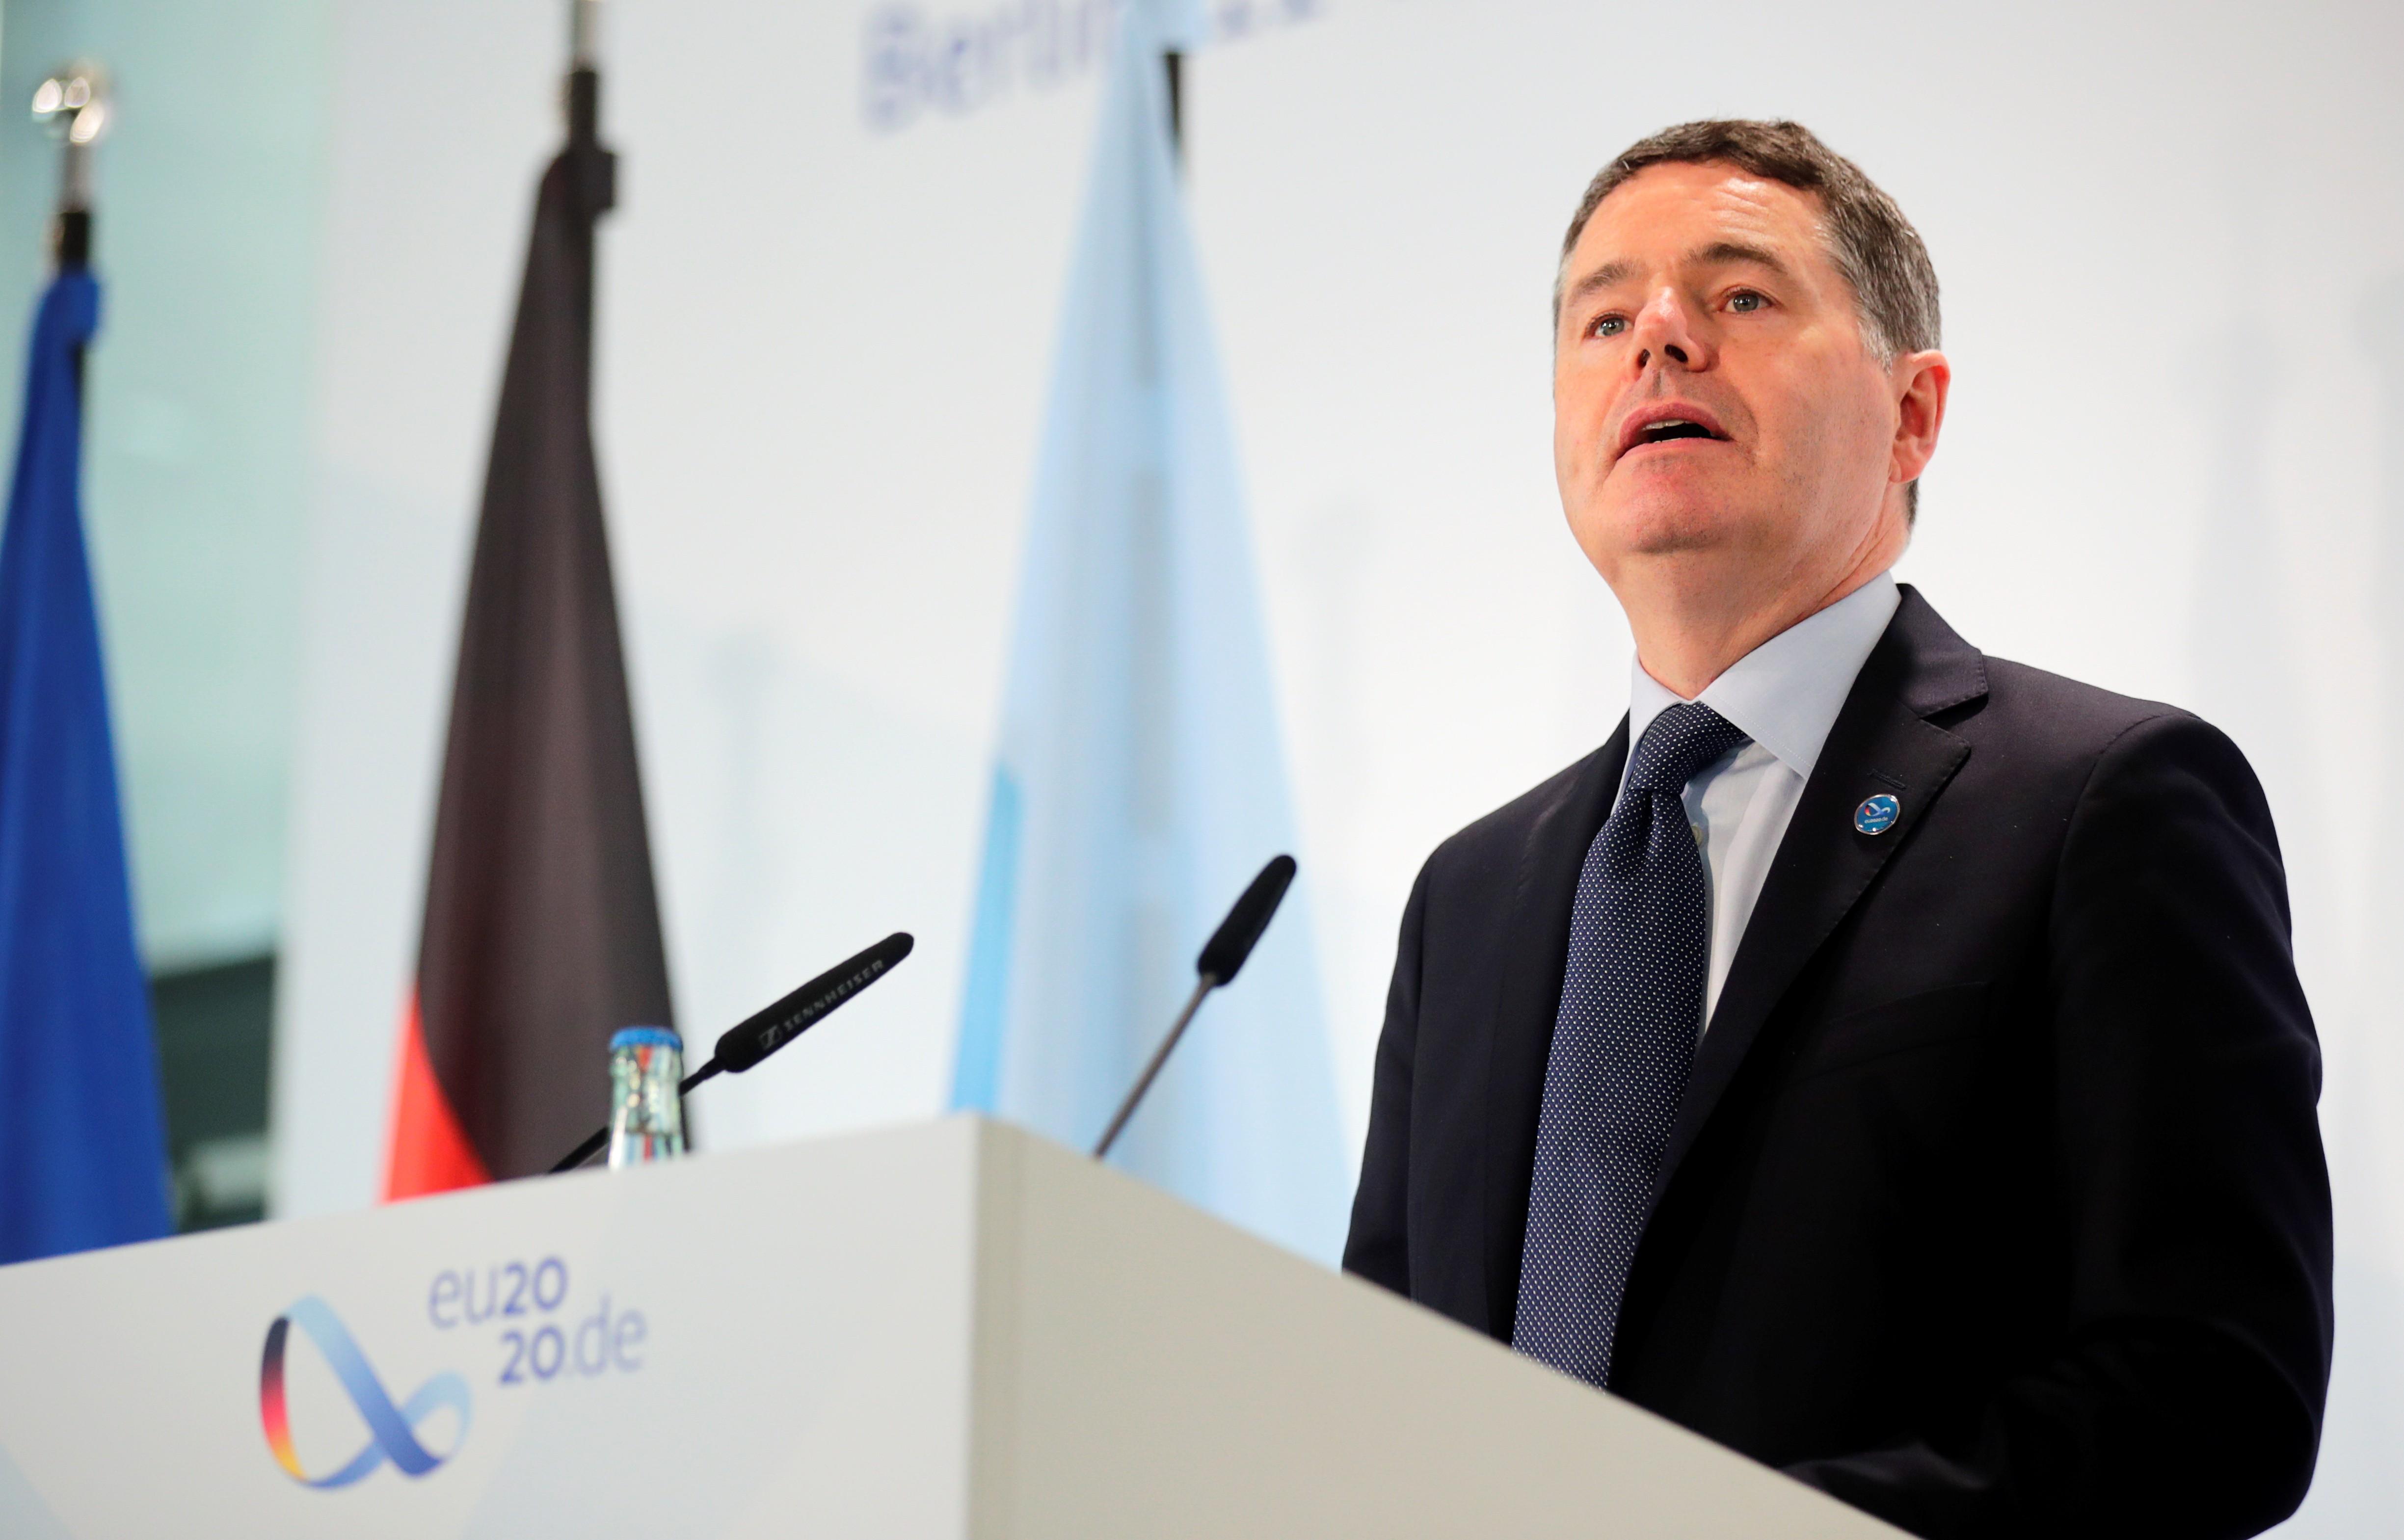 Ministros da zona do euro prometem apoio fiscal contínuo no enfrentamento ao coronavírus